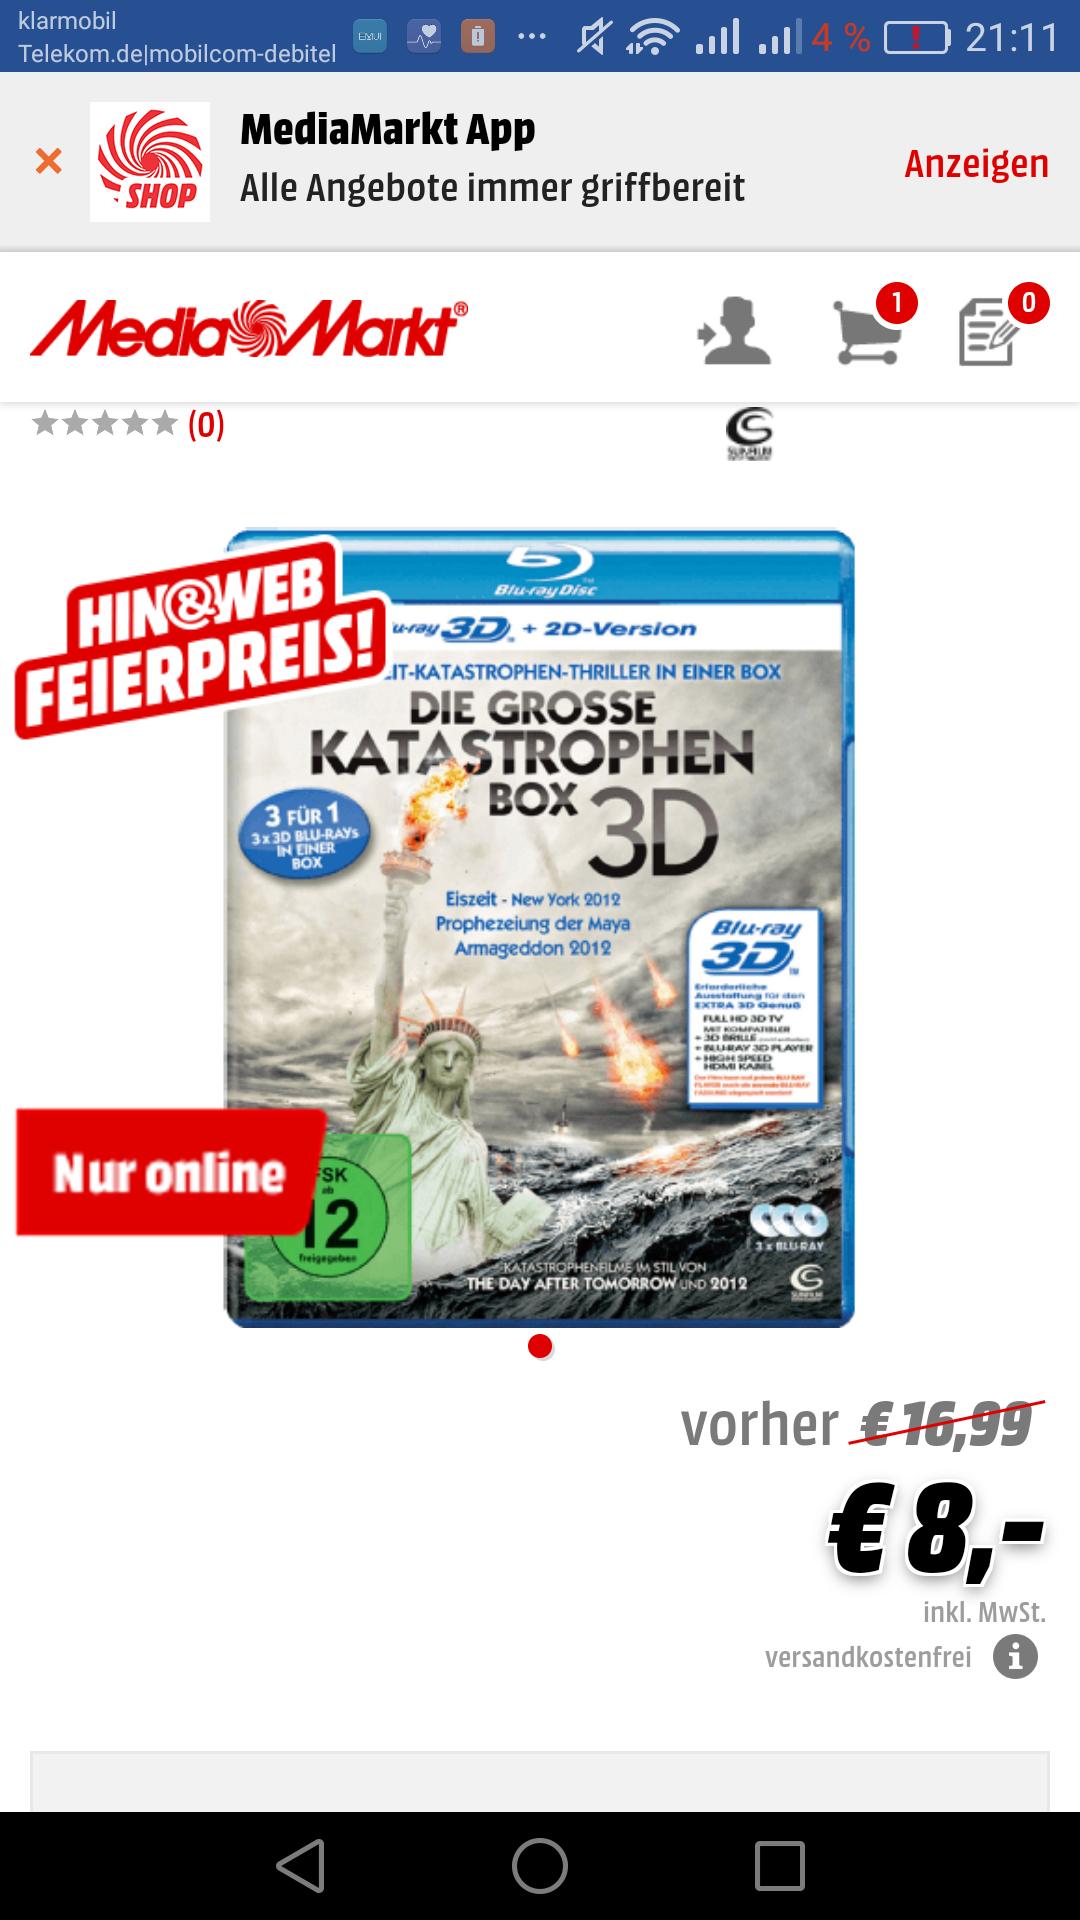 3D + 2D blu-ray Boxen ab 8 Euro, media markt